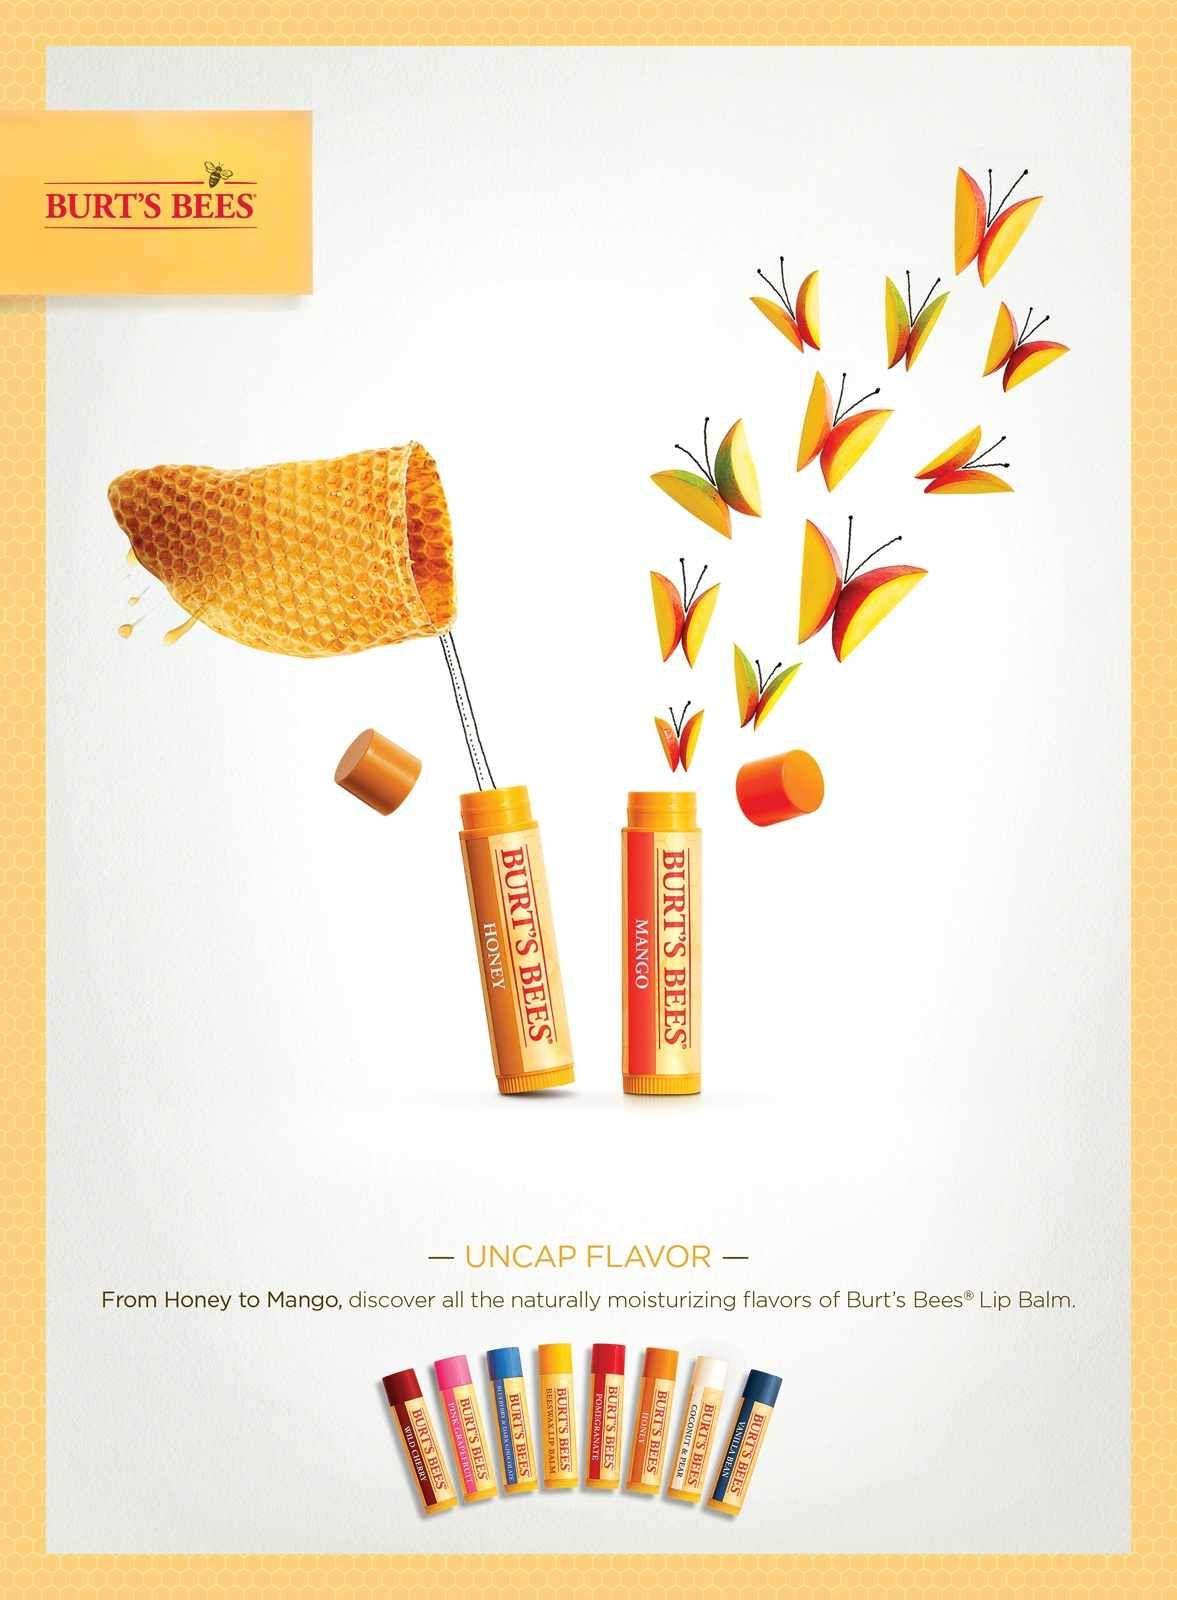 Burts Bees: Uncap Flavor, 3